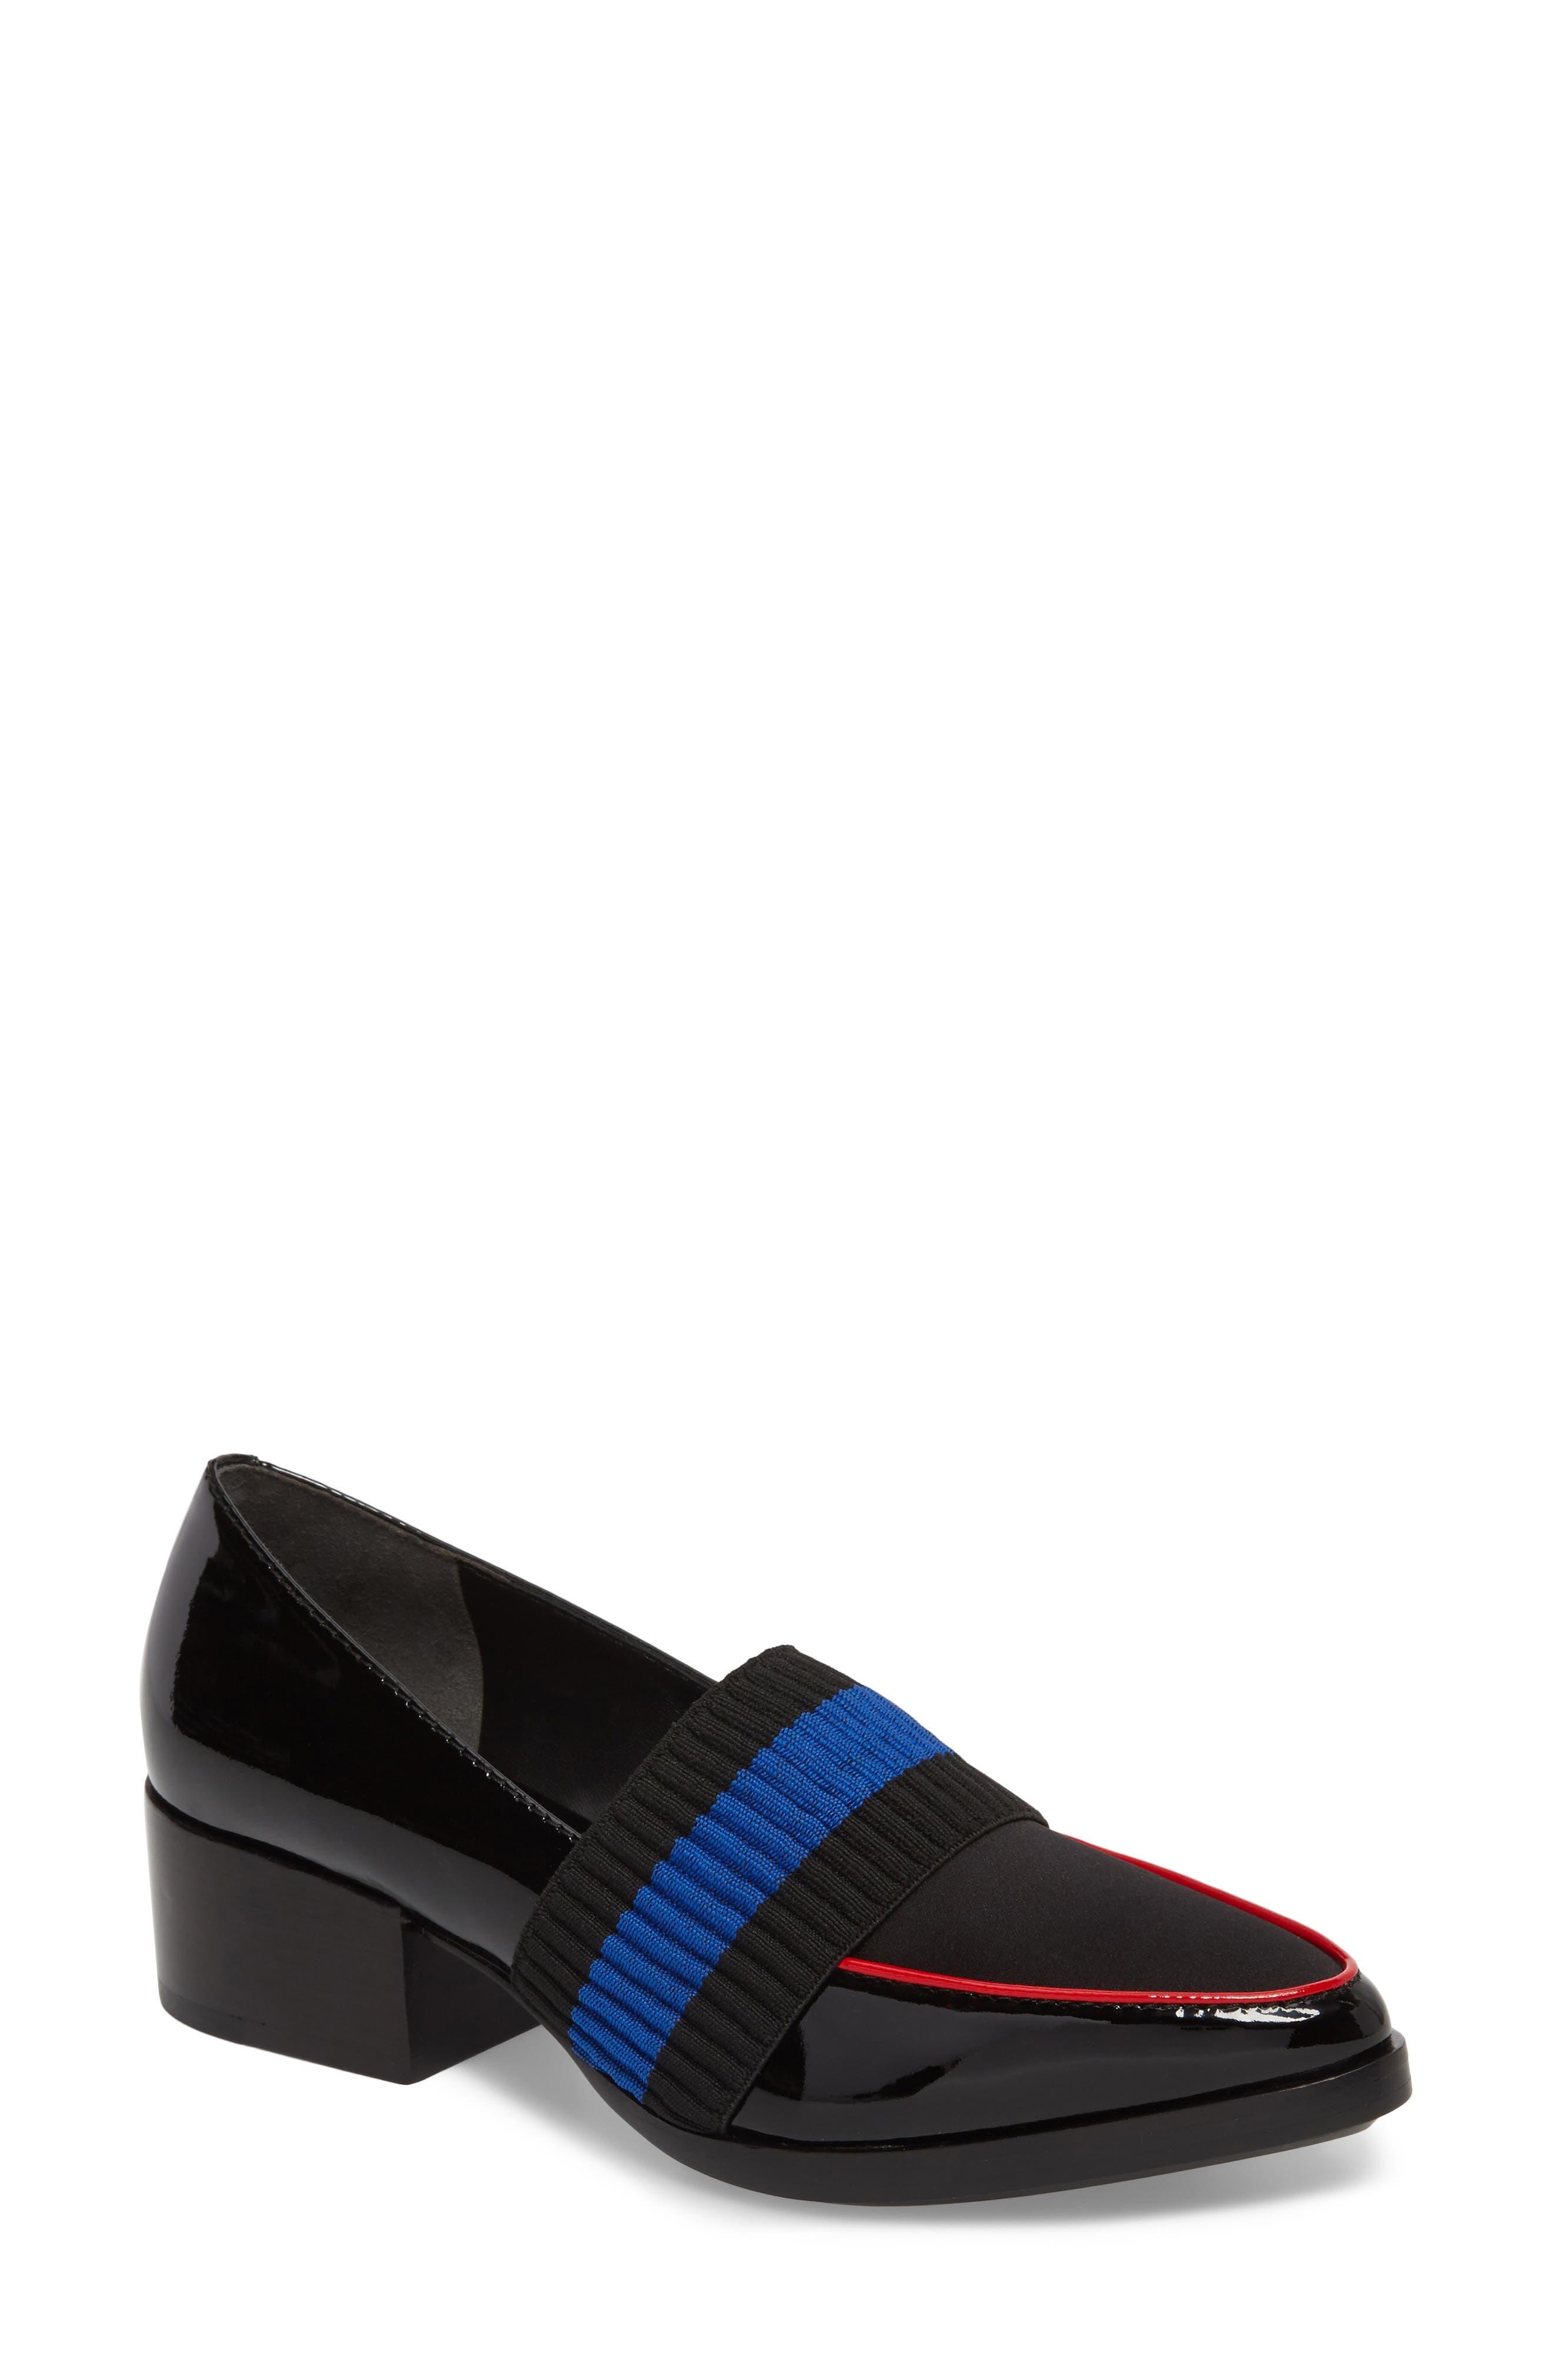 FOOTWEAR - Loafers 3.1 Phillip Lim F17pmmLA3